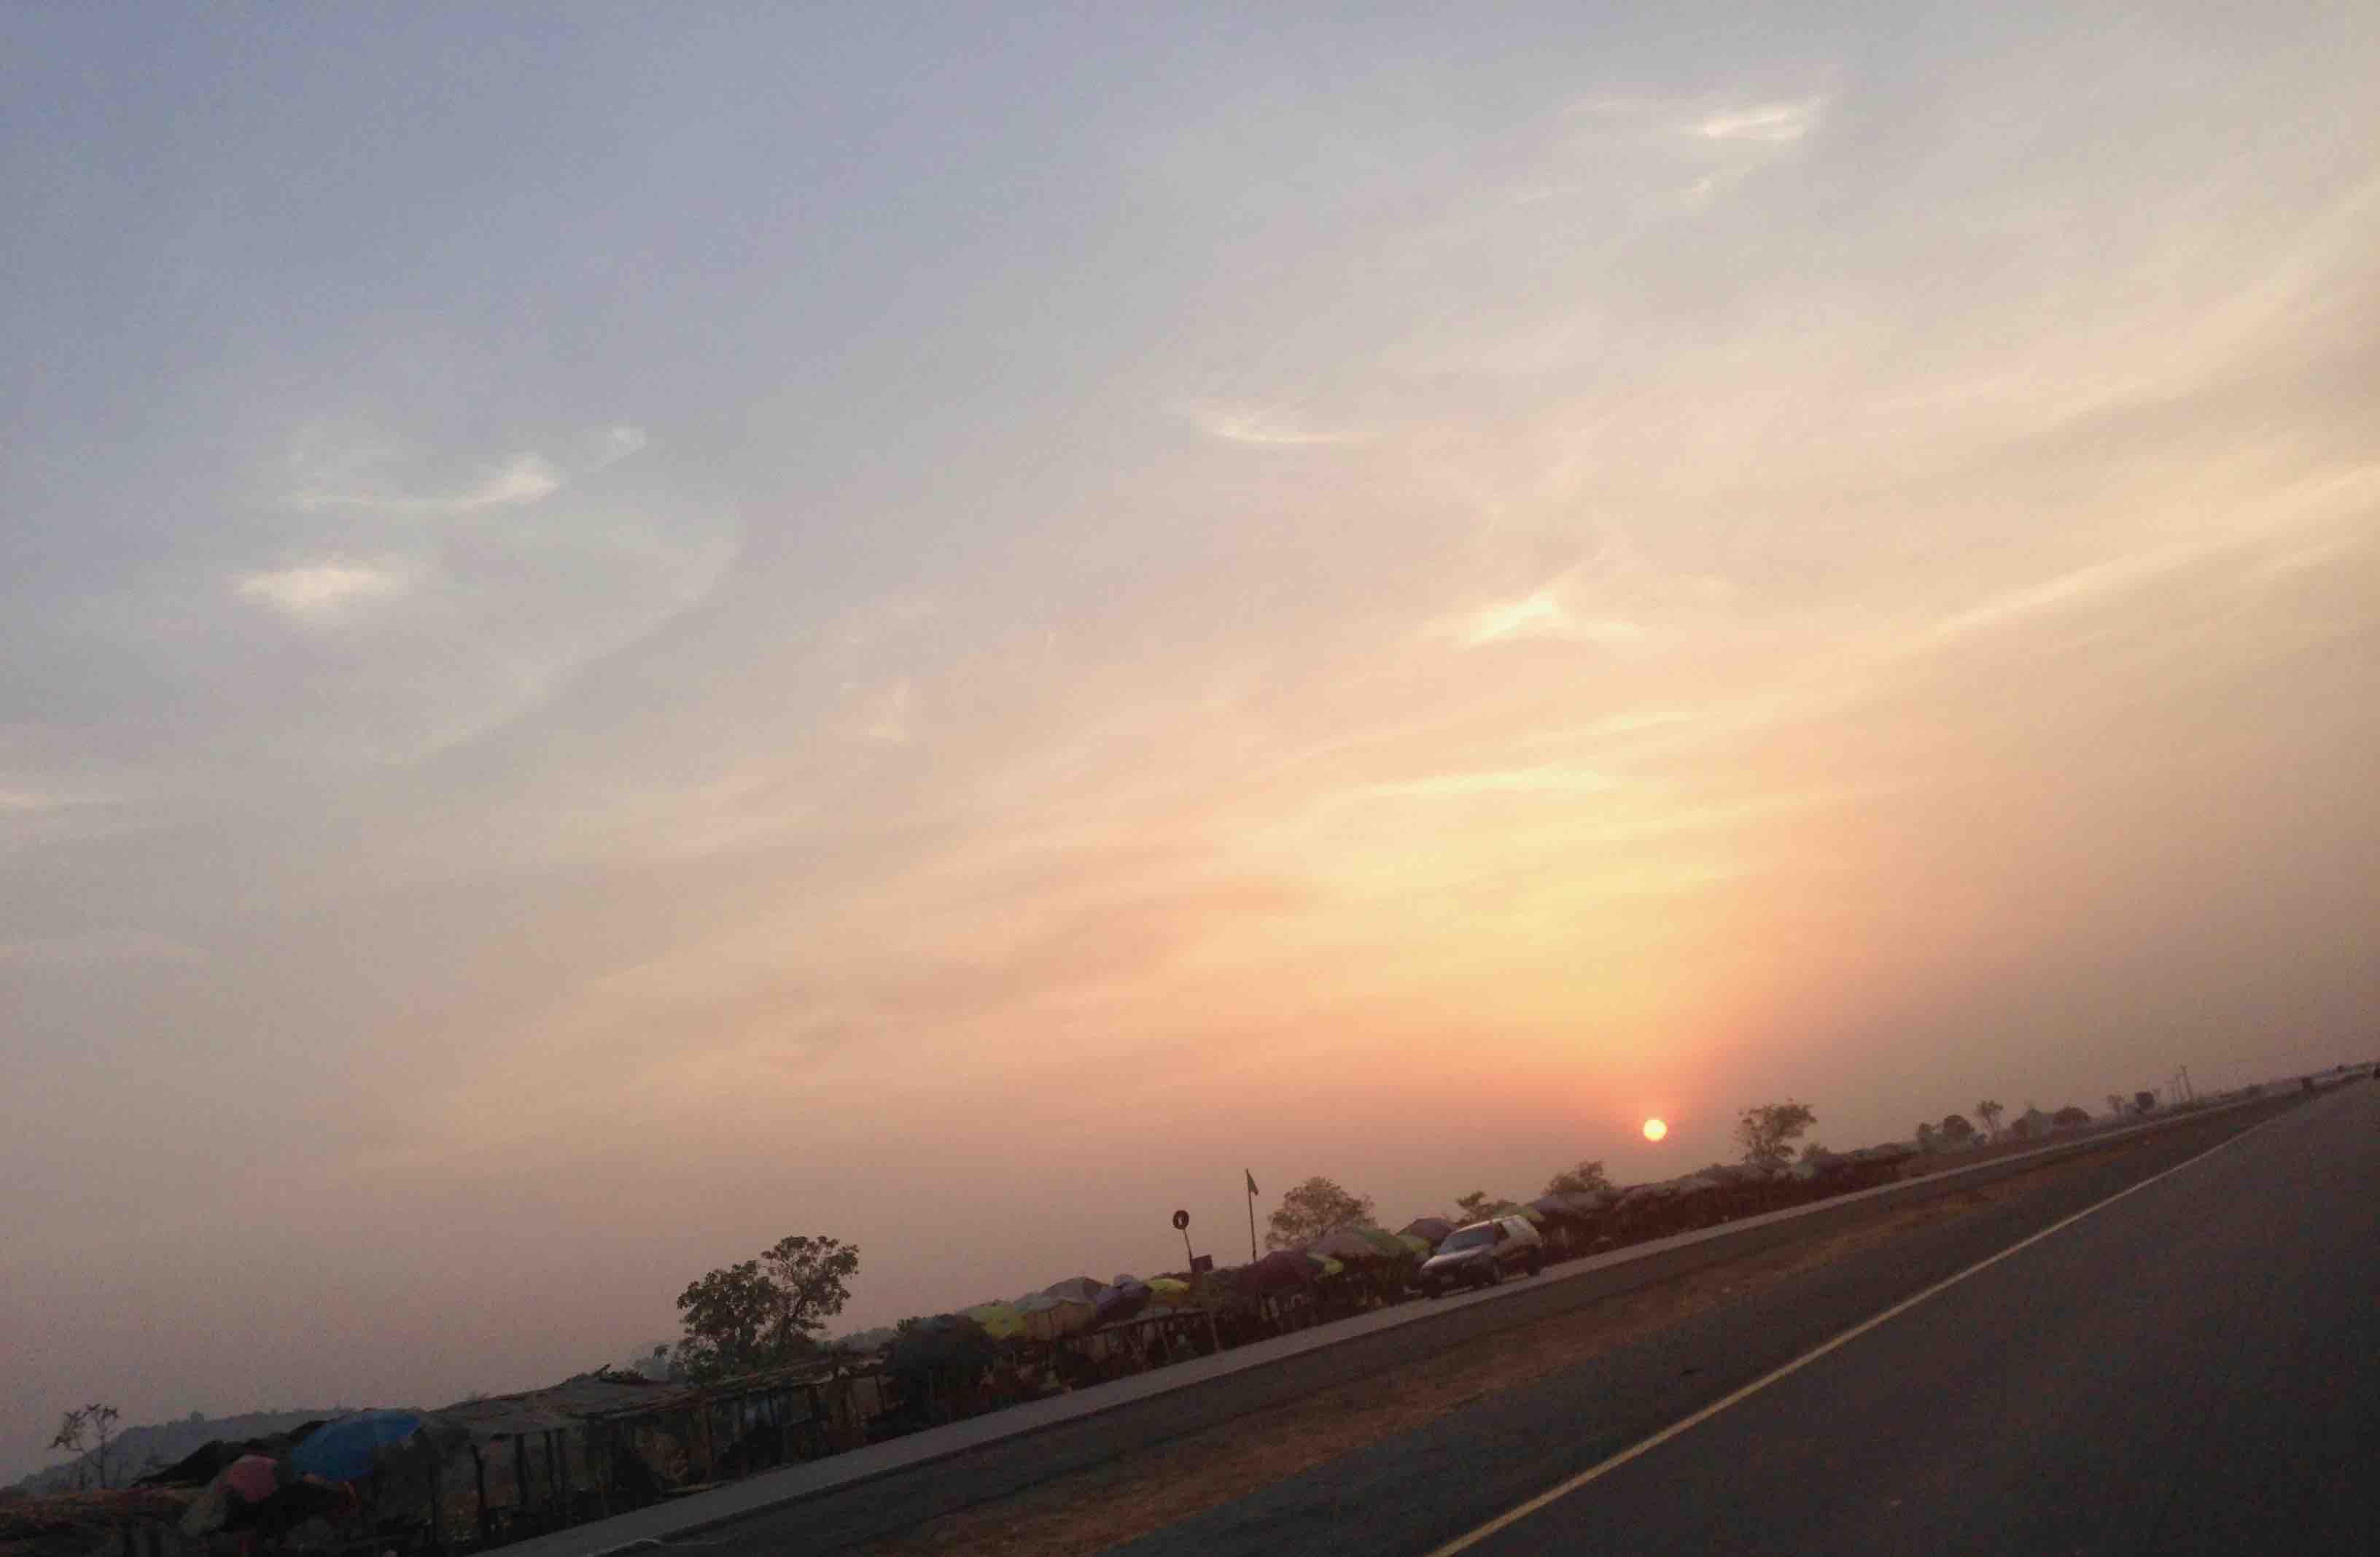 Sunrise, Abuja, Nigeria. #JujuFilms